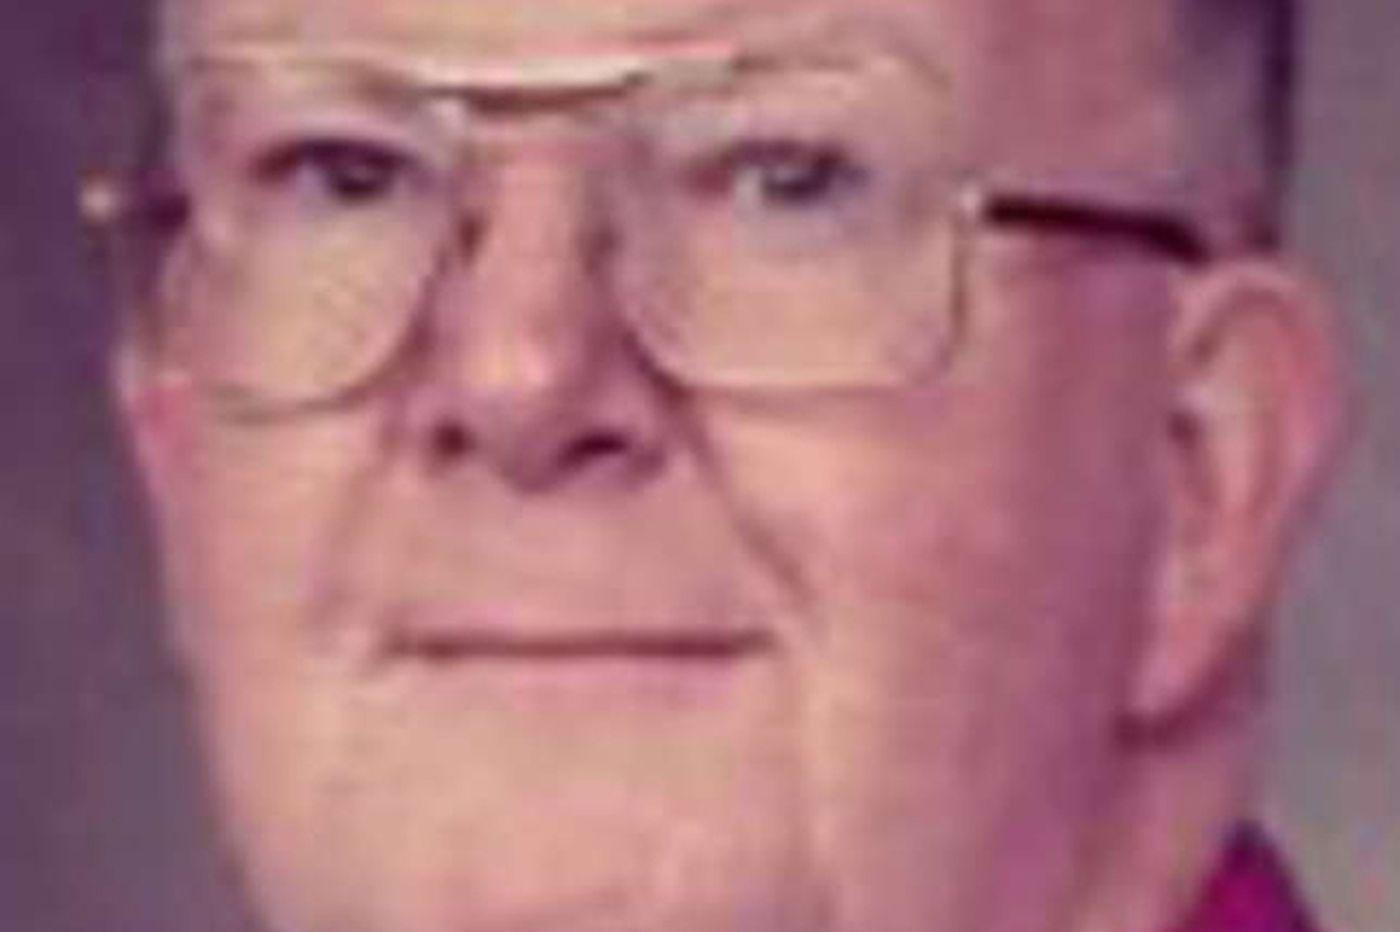 Msgr. Fitzsimmons, 81, church lawyer